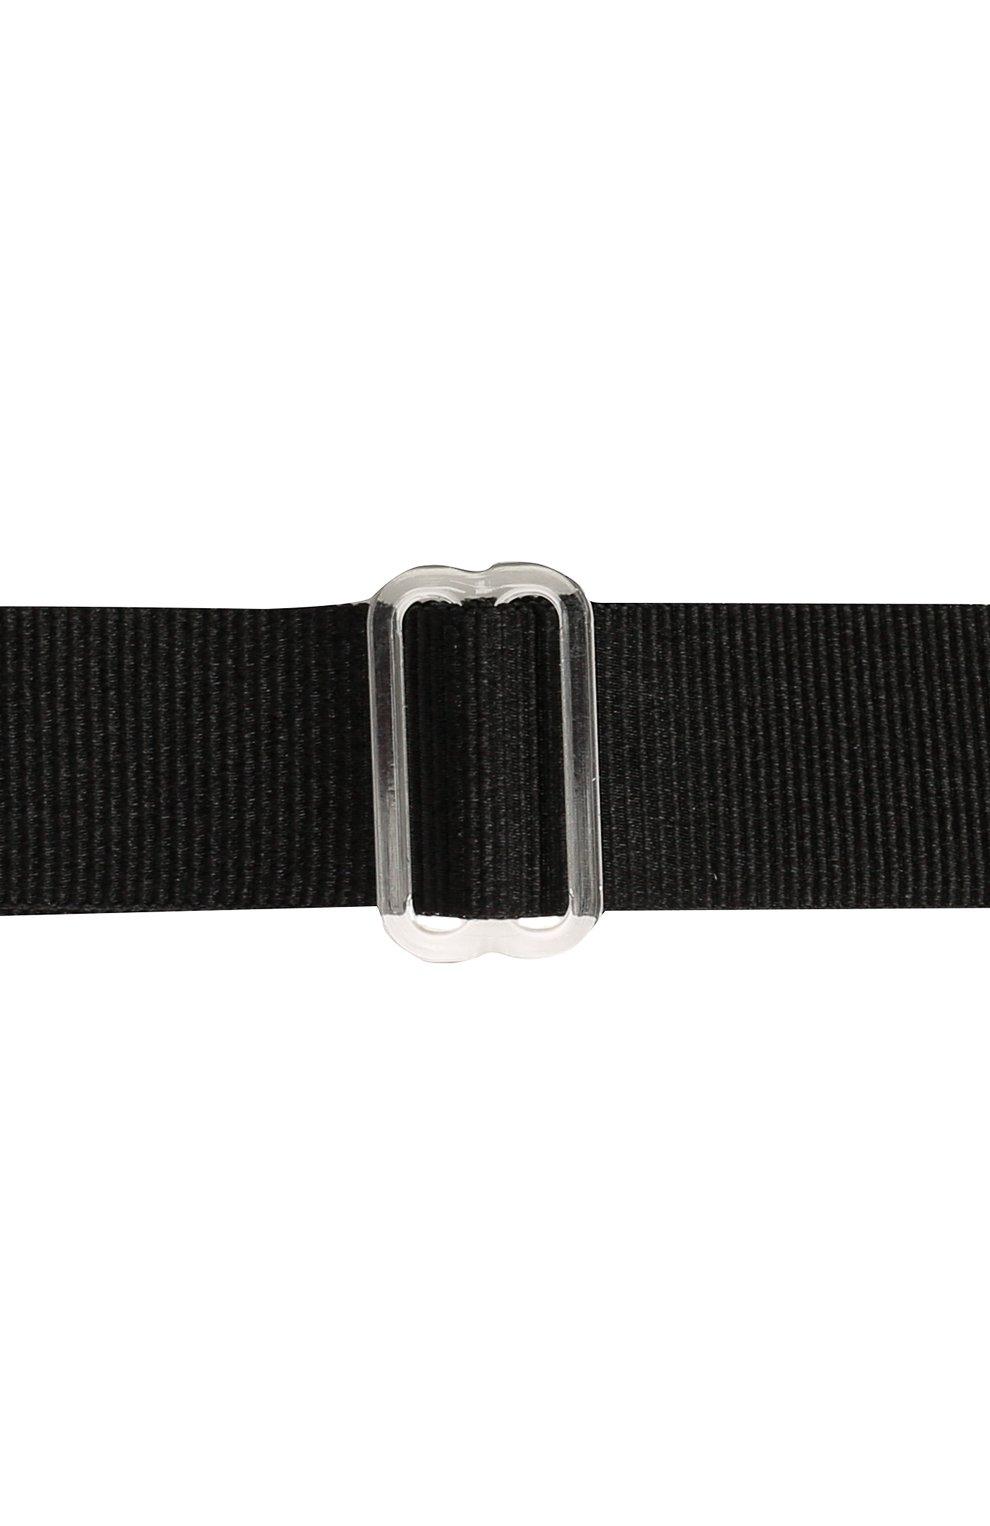 Детский галстук-бабочка PAOLO PECORA MILANO черного цвета, арт. PP2620 | Фото 3 (Материал: Текстиль, Синтетический материал)